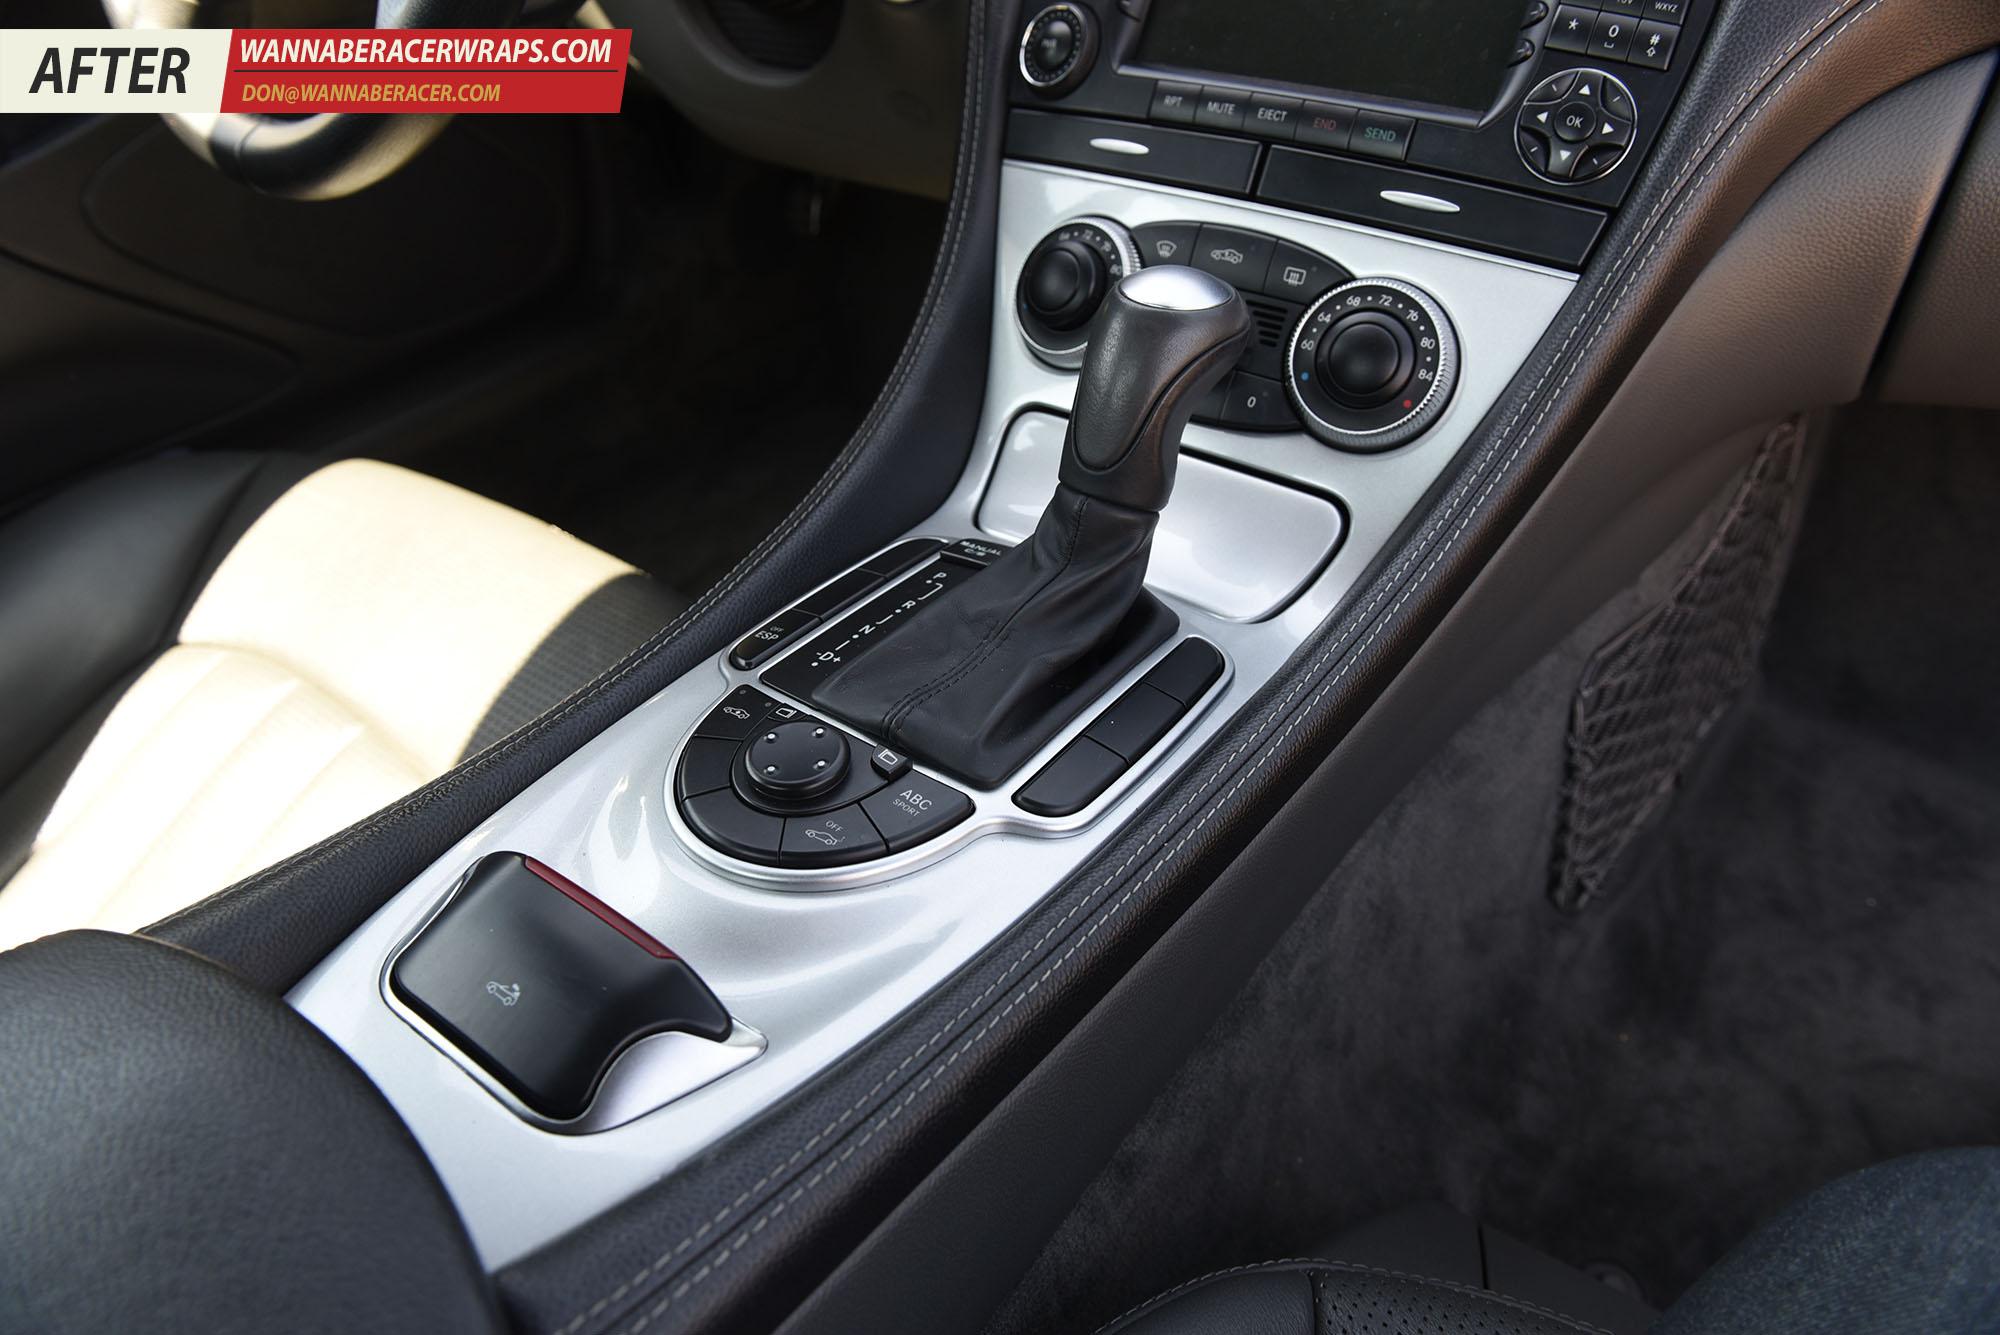 Mercedes SL55 AMG - Gloss Silver 3M 1080 G251 Interior Trim Vinyl Car Wrap